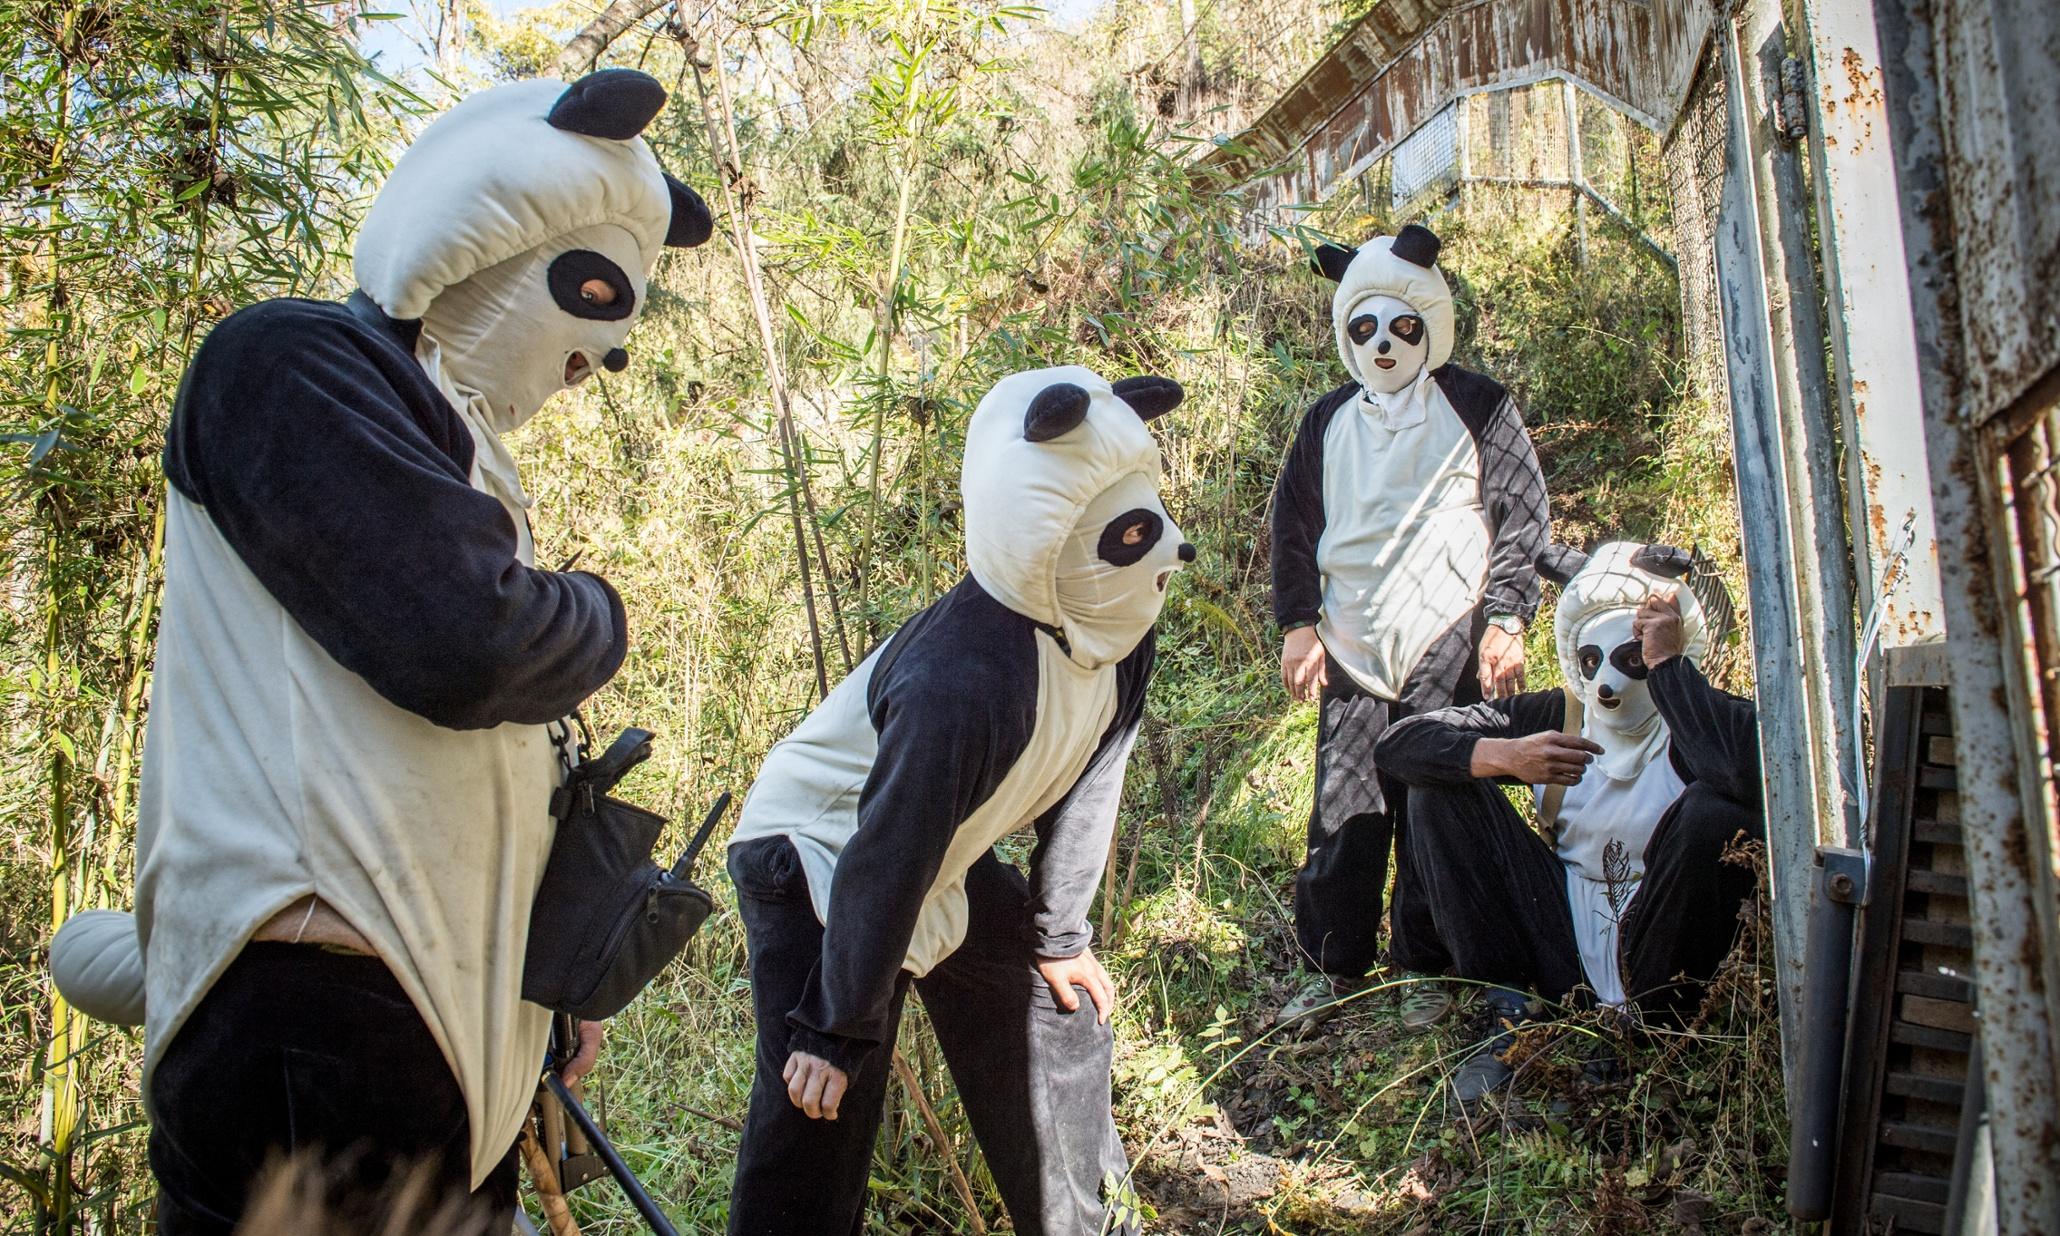 Pornhub Just Sent Out A Casting Call For Panda Shaggers